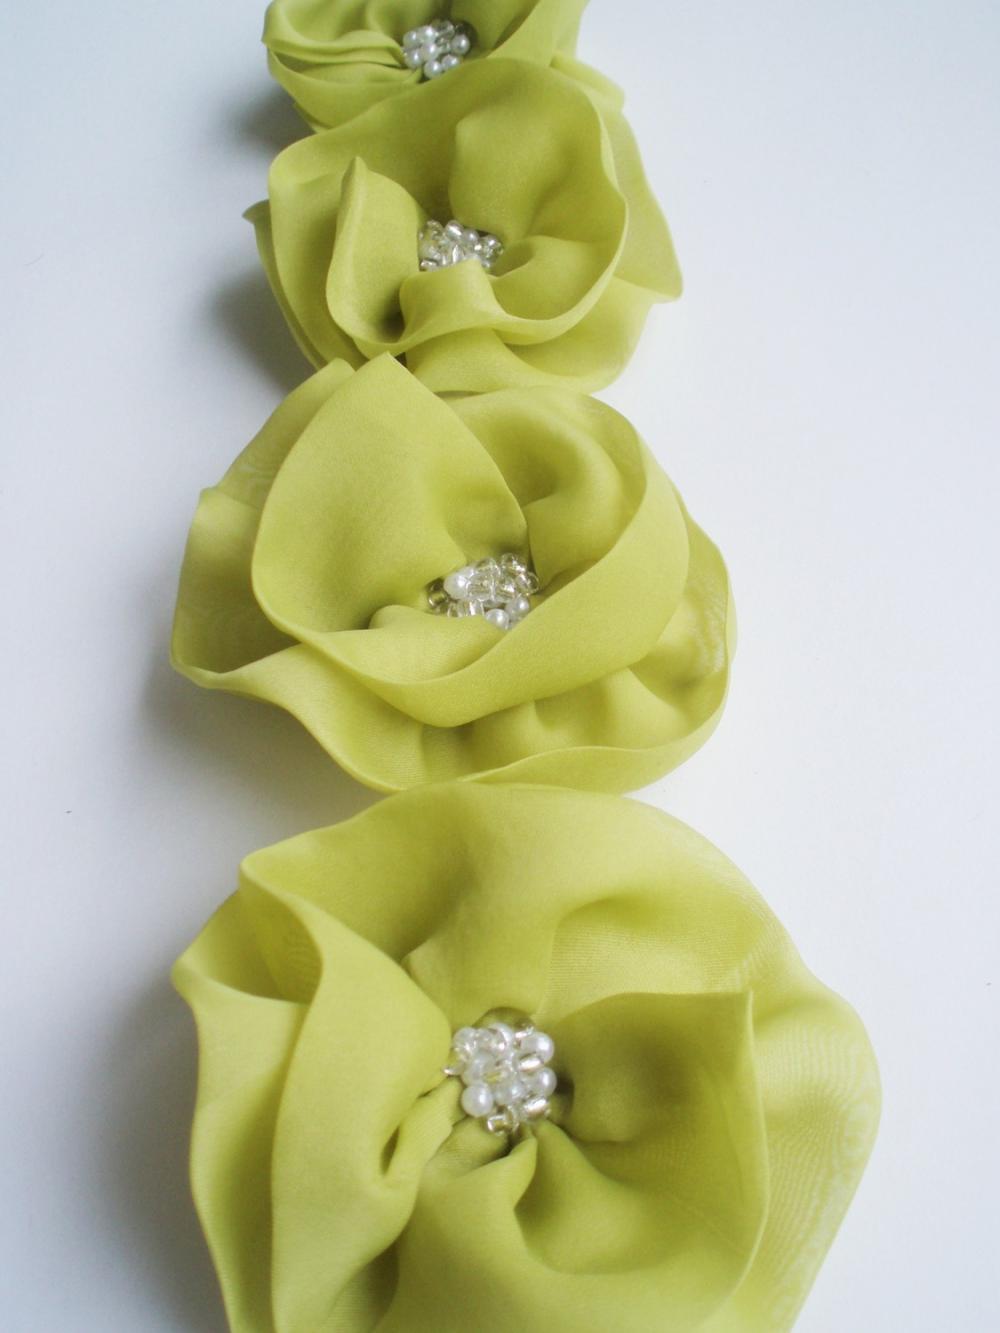 Lime Flowers Handmade Appliques Embellishments(4 pcs)